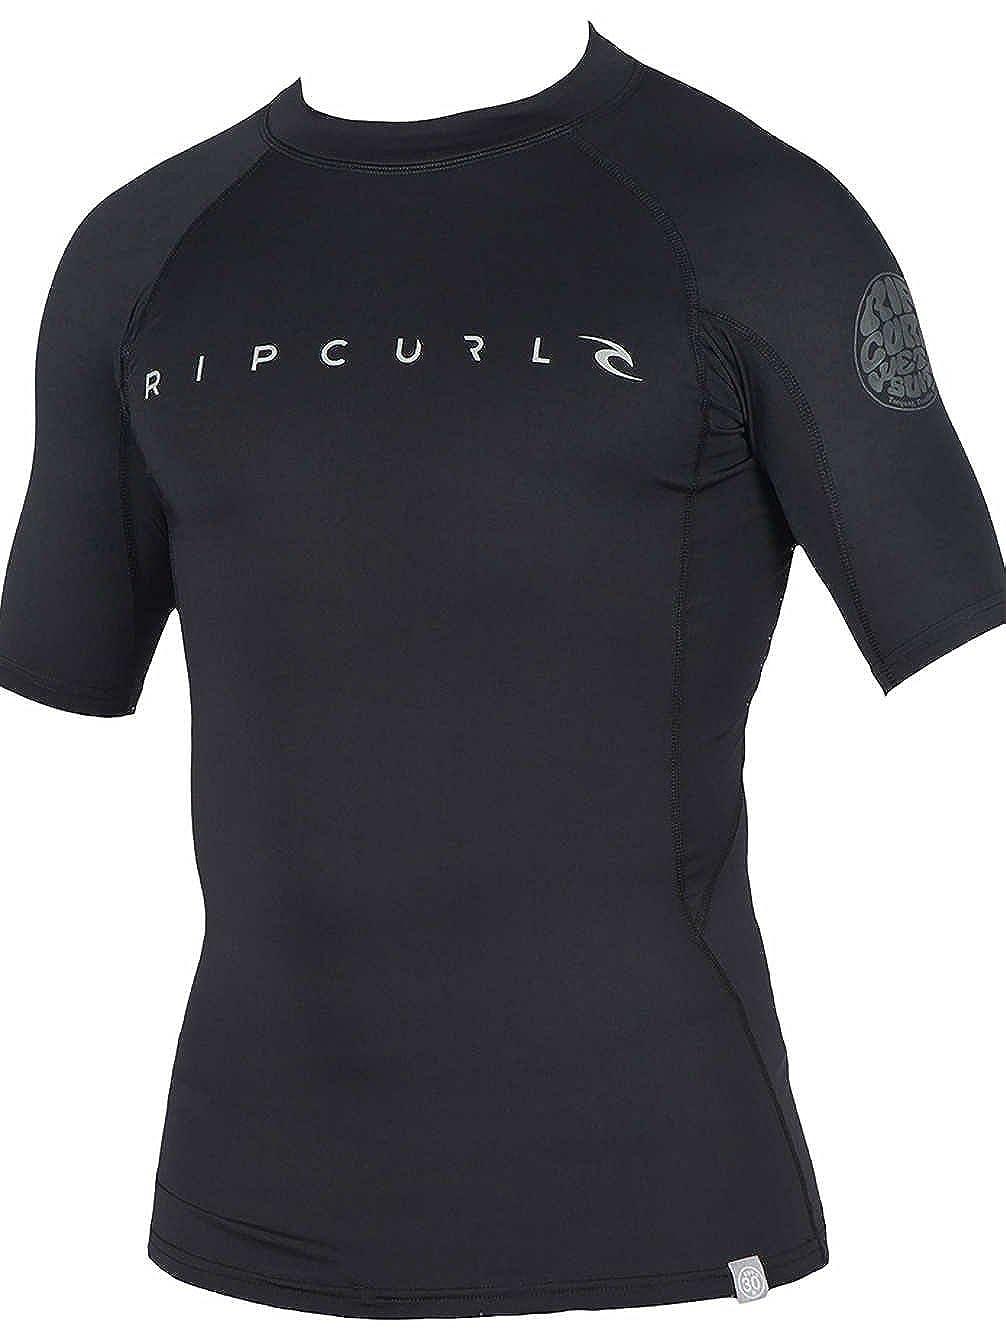 RIP CURL Mens Dawn Patrol Short Sleeve Rash Vest Black WLUGDM Size L